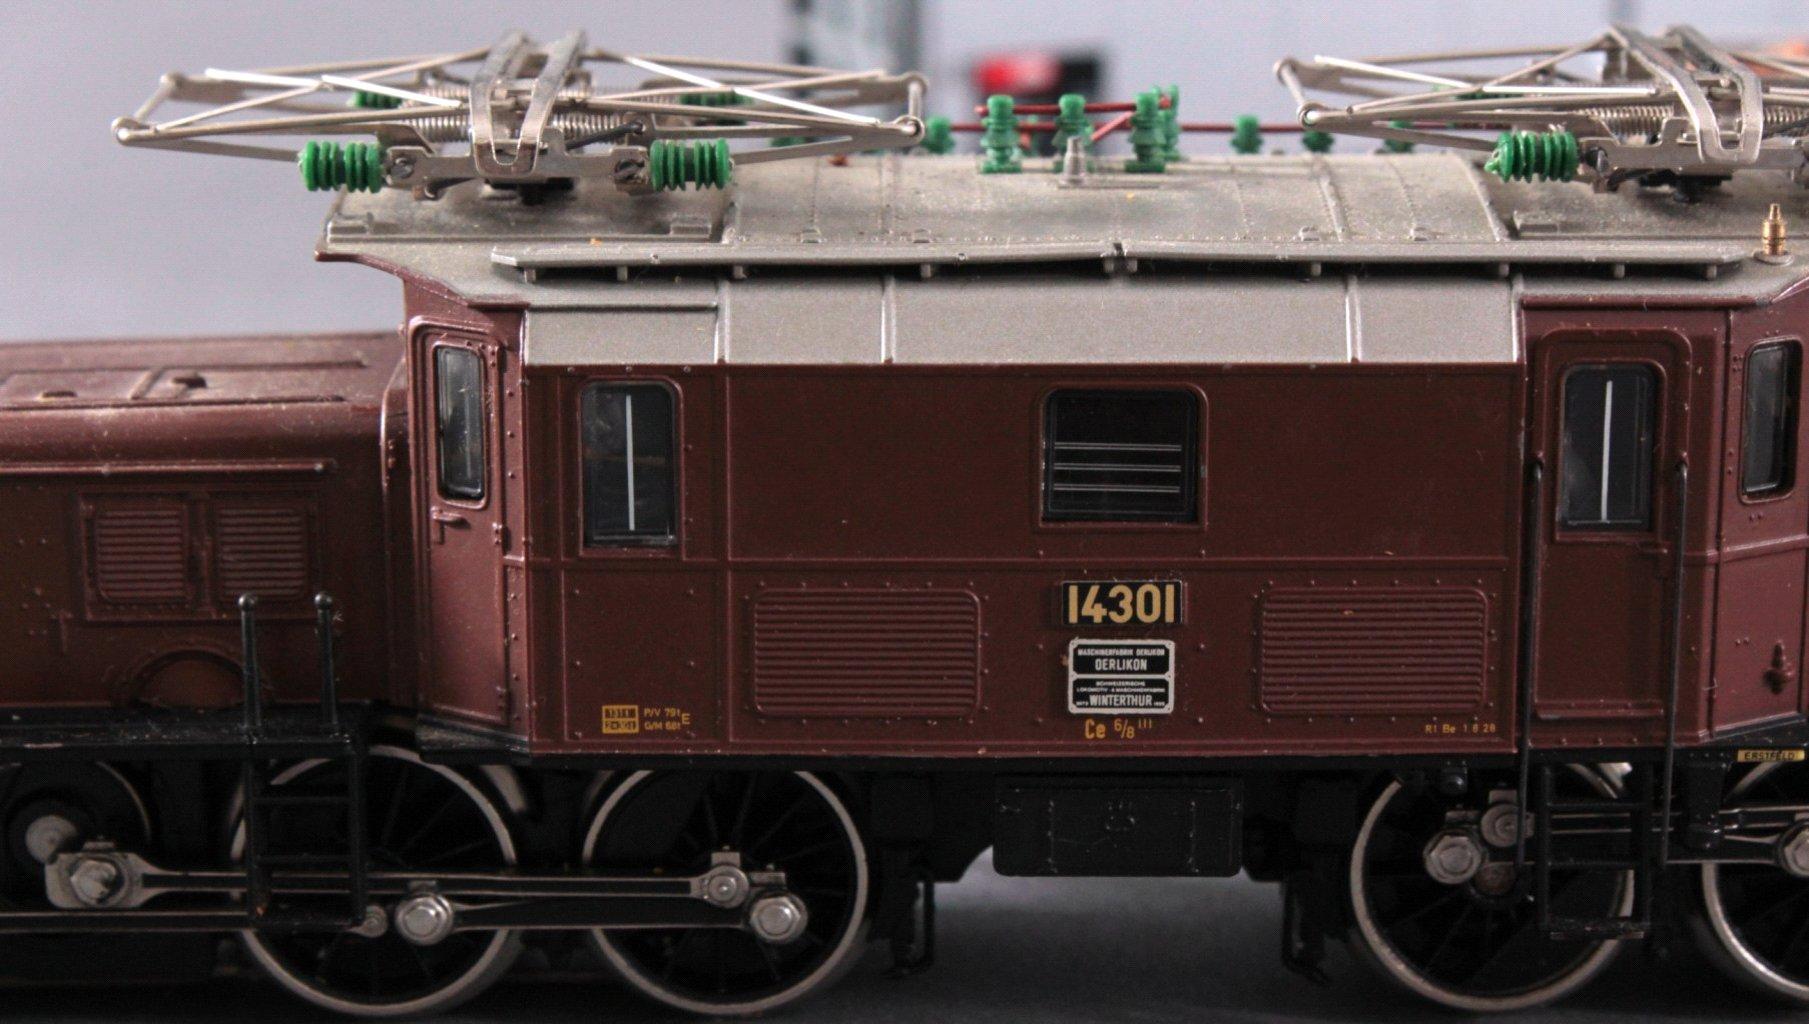 Märklin H0 3652 E-Lok Krokodil BR 14301 in braun mit-2